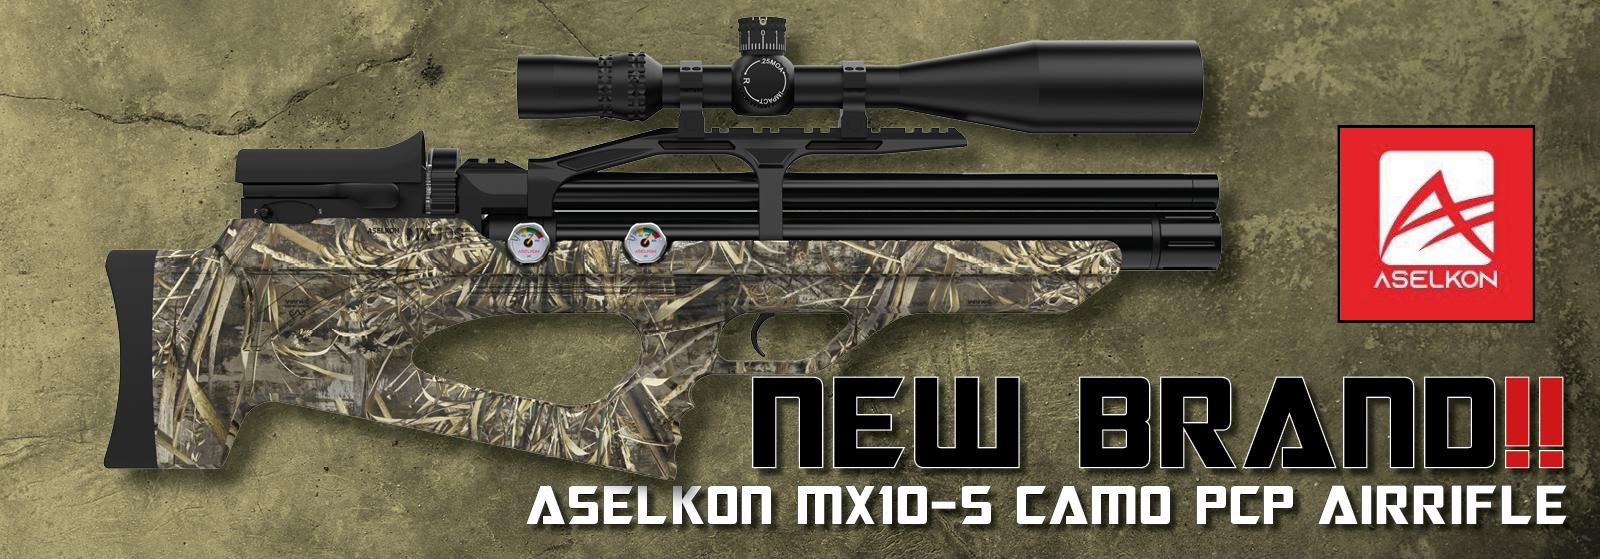 Aselkon MX10-S Camo PCP-luftgevær hos AIRGUN.dk